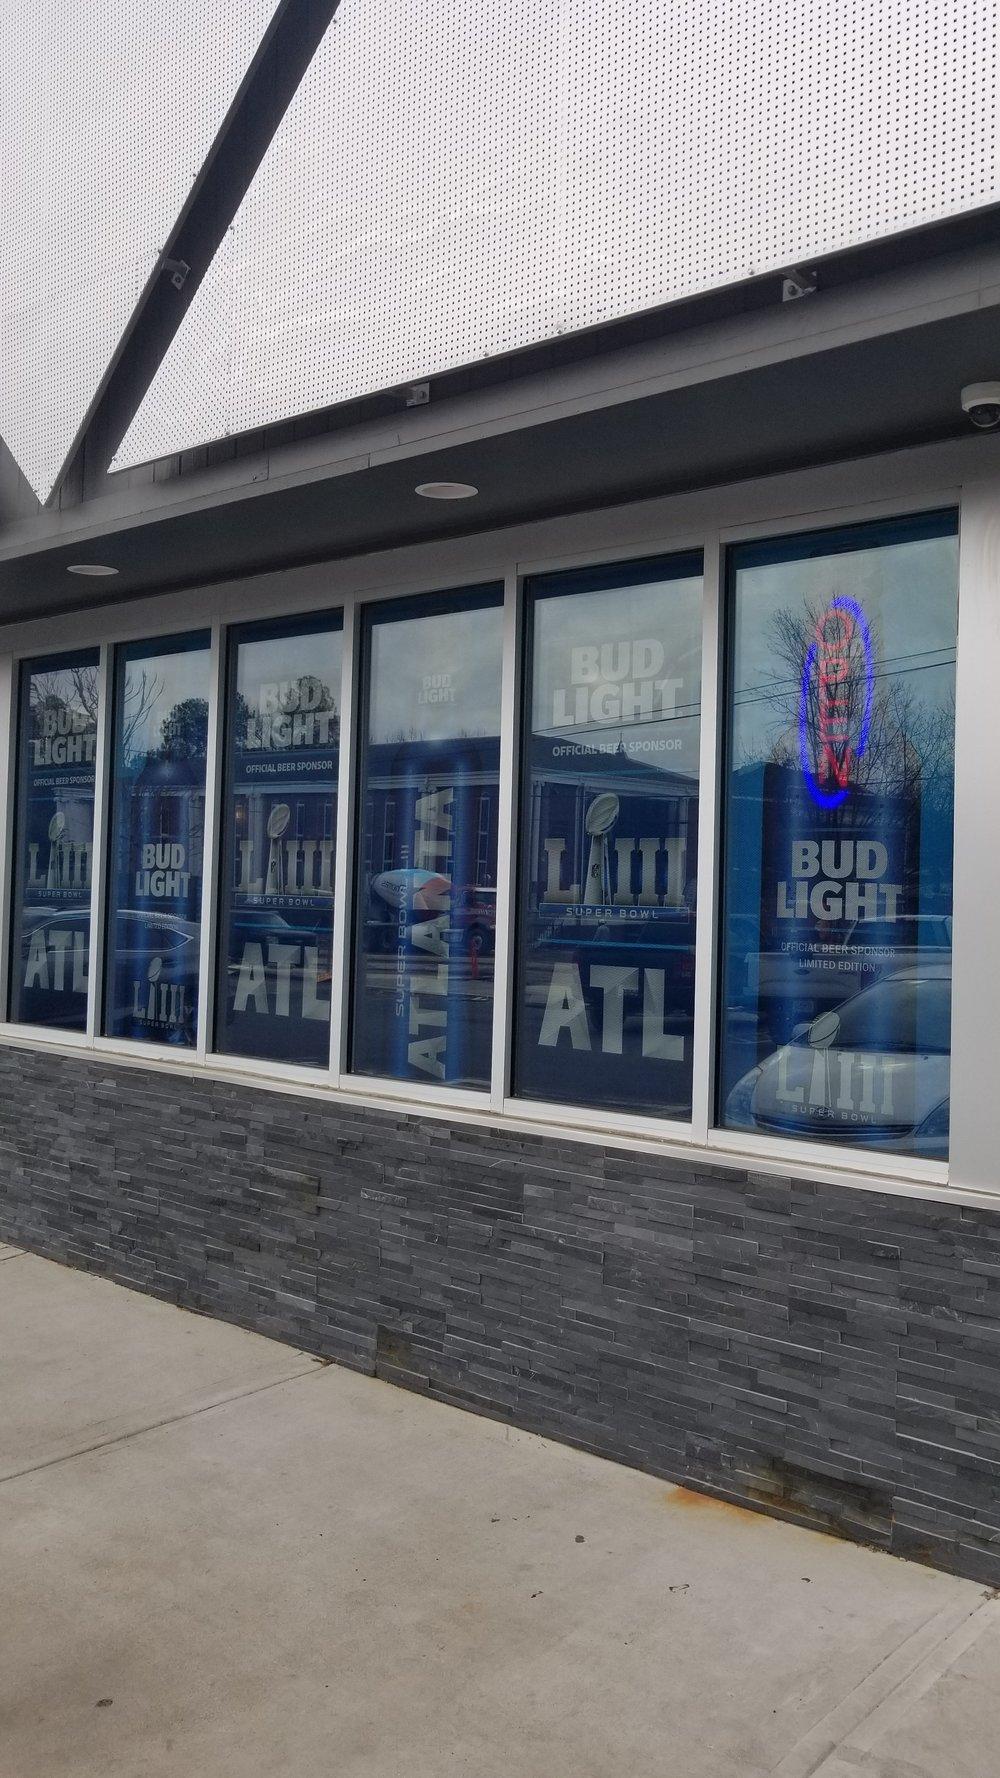 Anheuser-Busch-Super-Bowl-LIII_Restaurant-Ten_Window-Graphics_Events_LSIGraphics_Atlanta-GA_2 ..